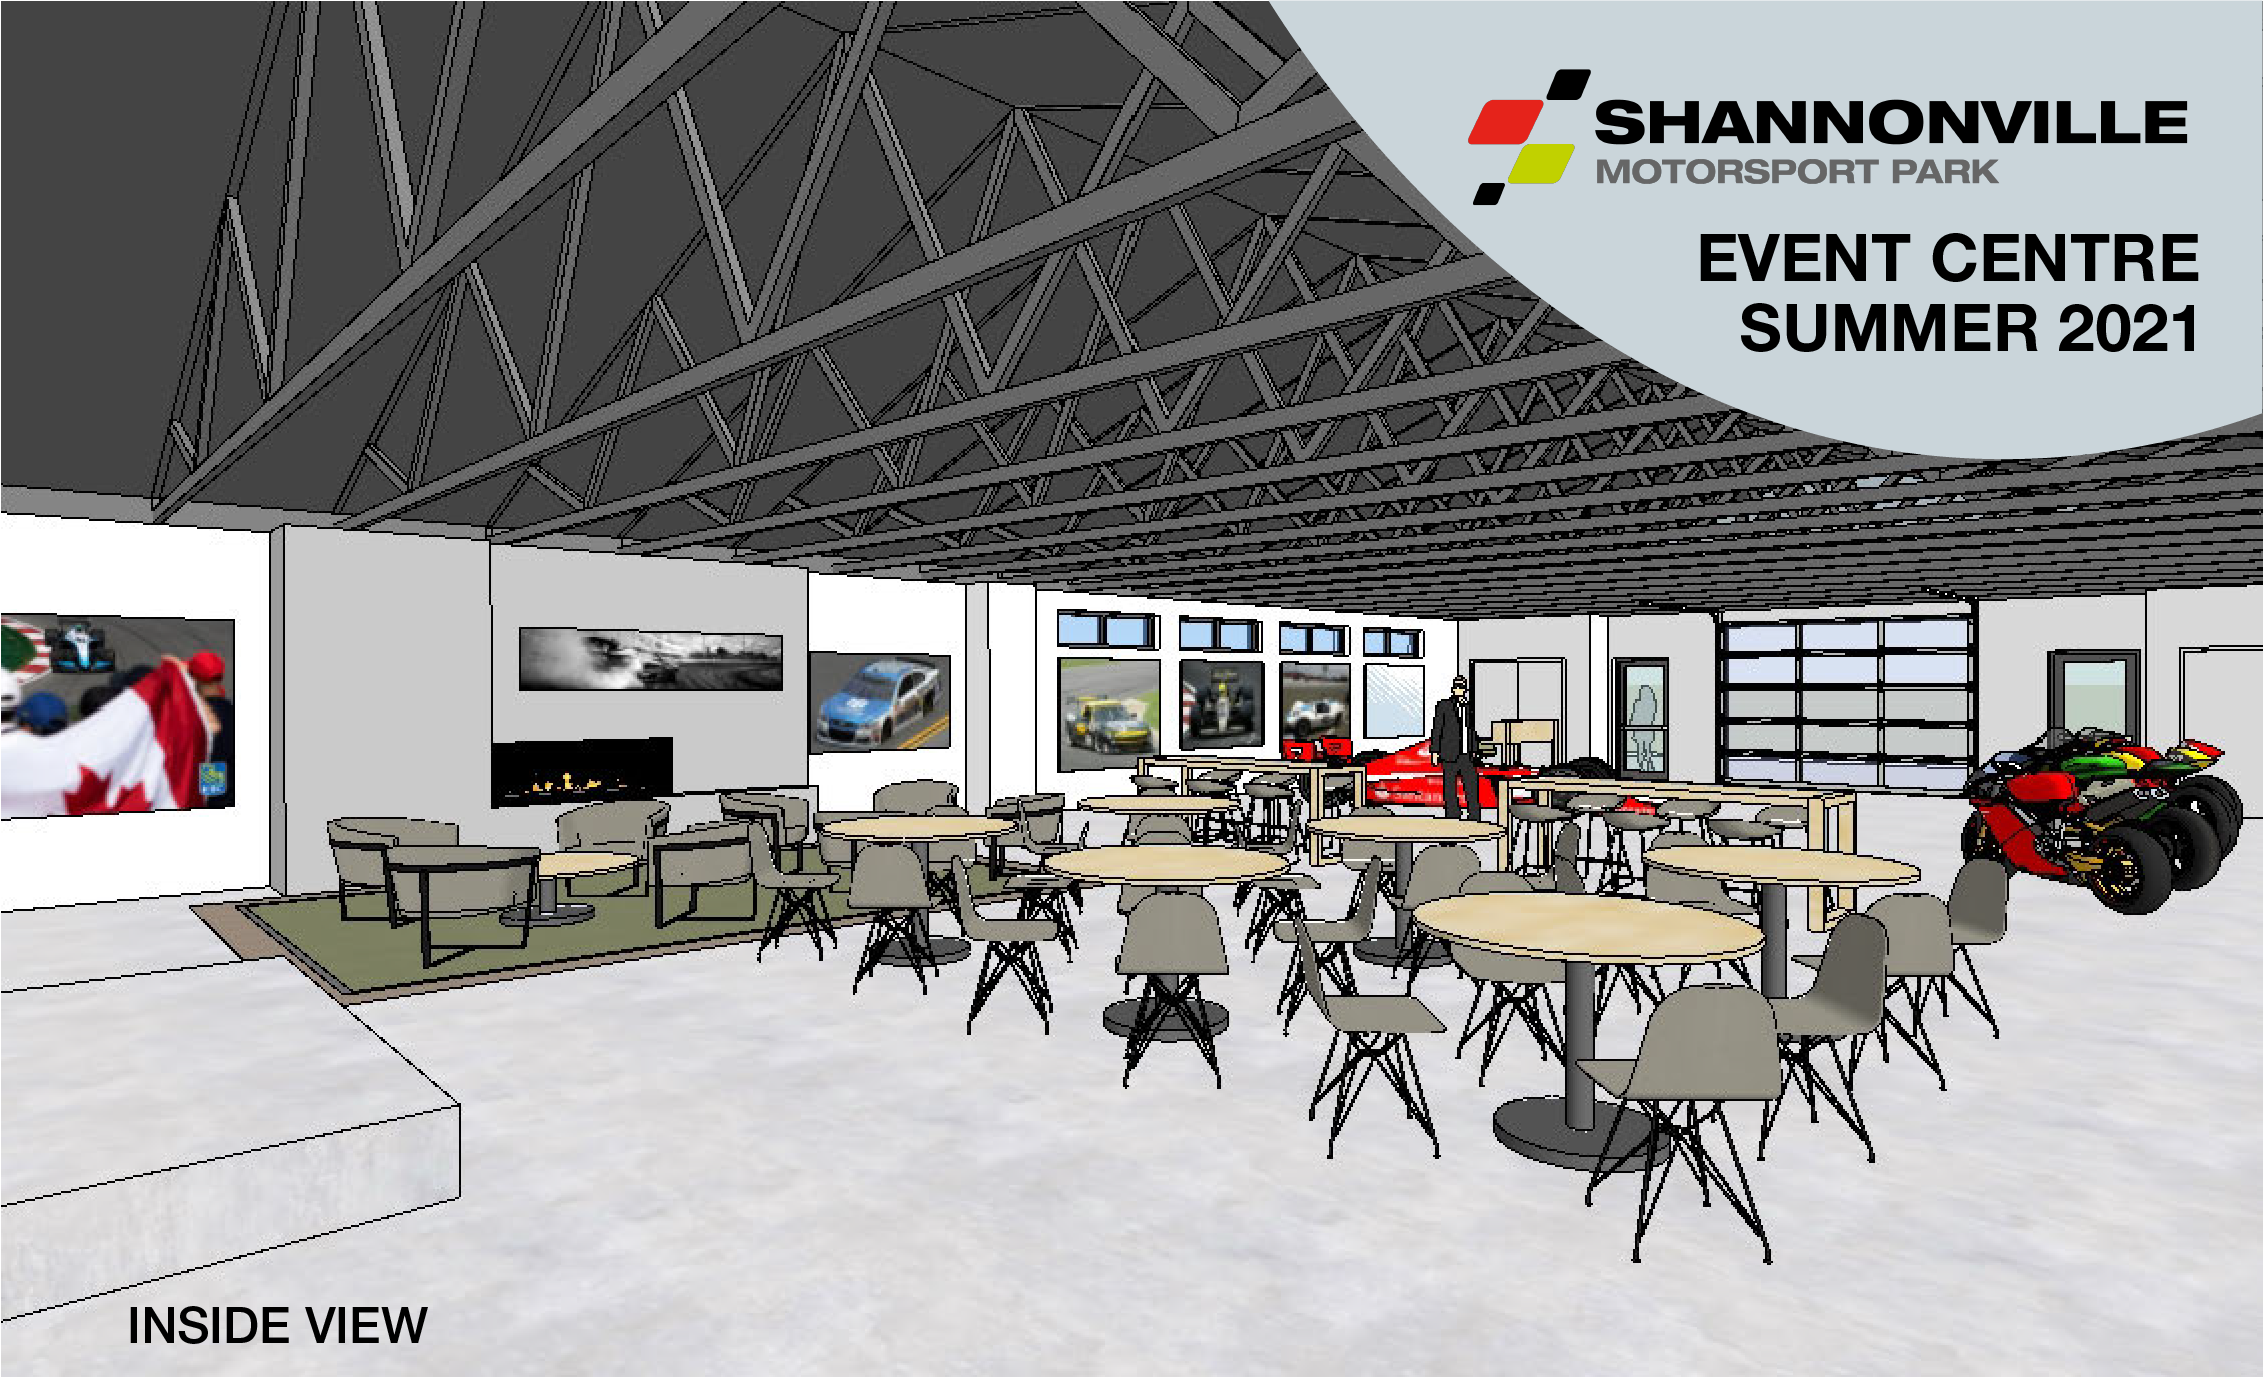 Shannonville event centre